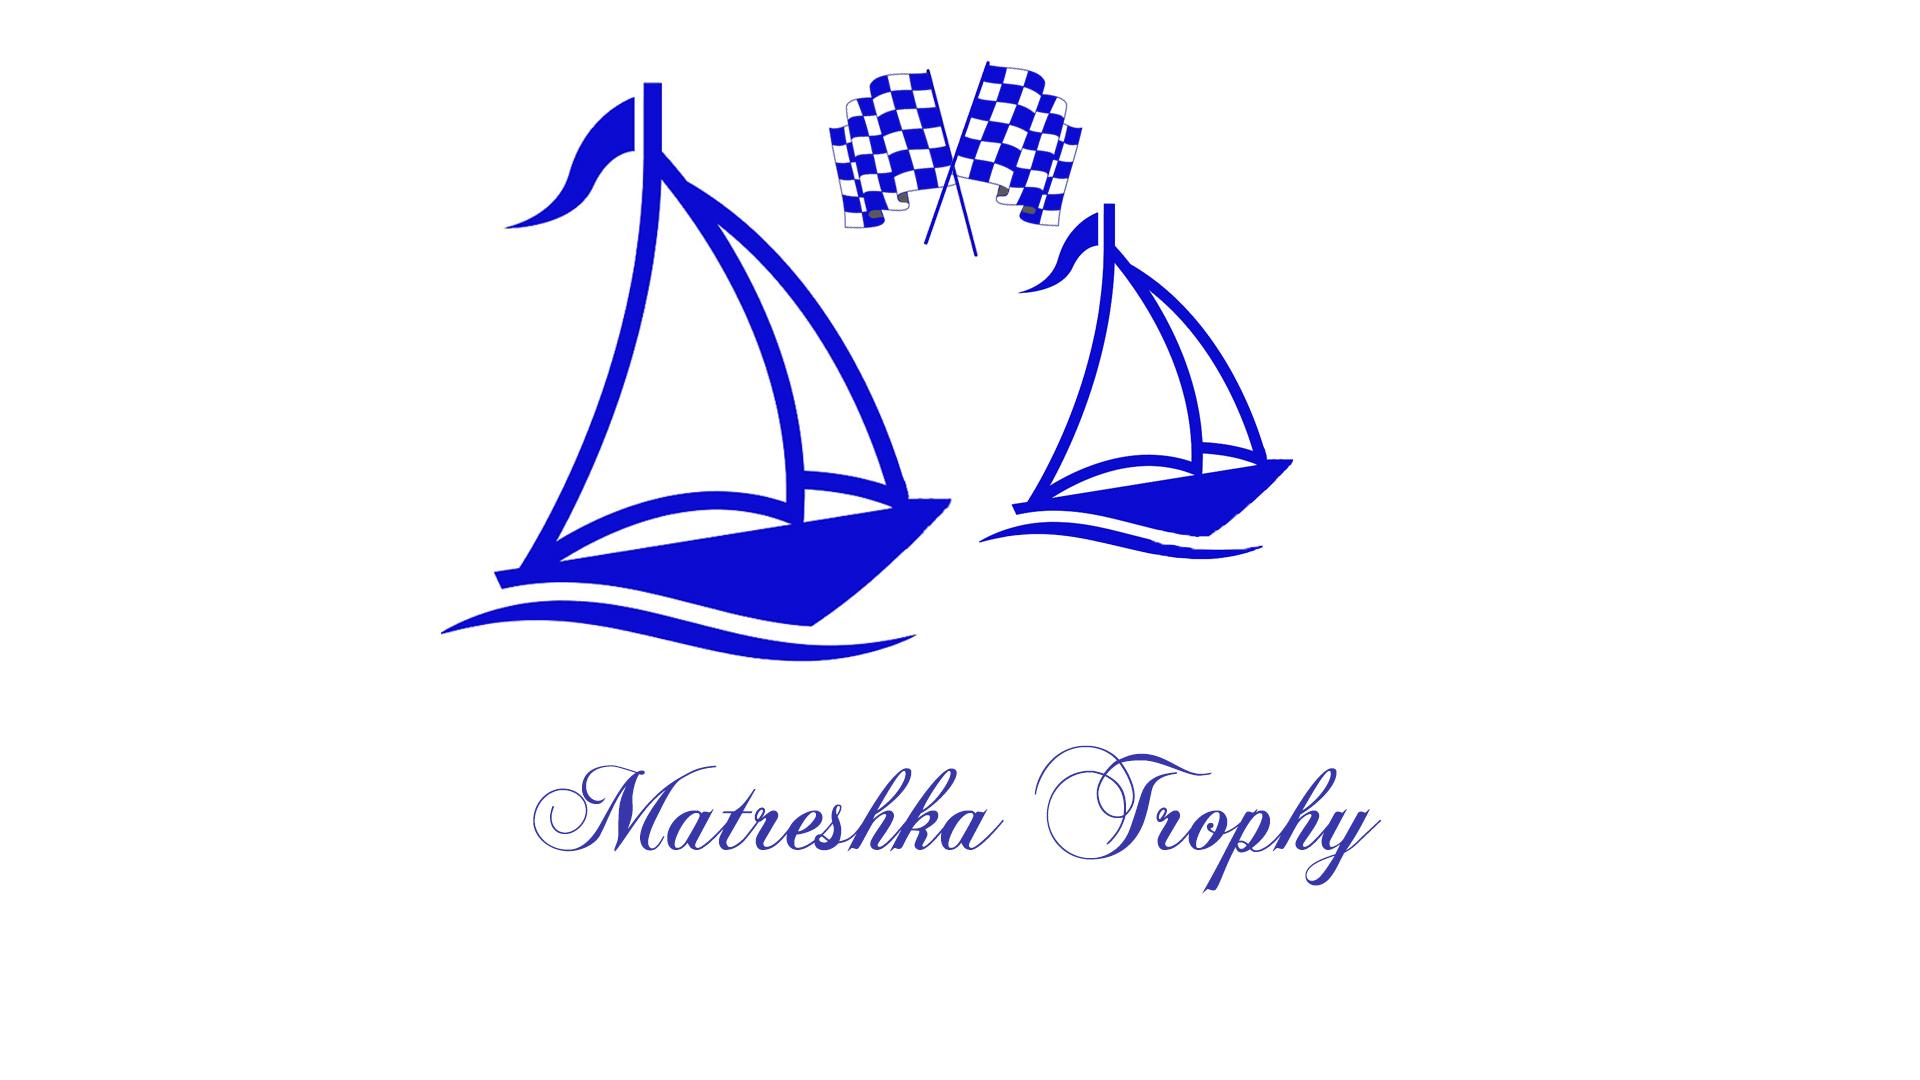 Логотип парусной регаты фото f_3725a302ee265a69.jpg